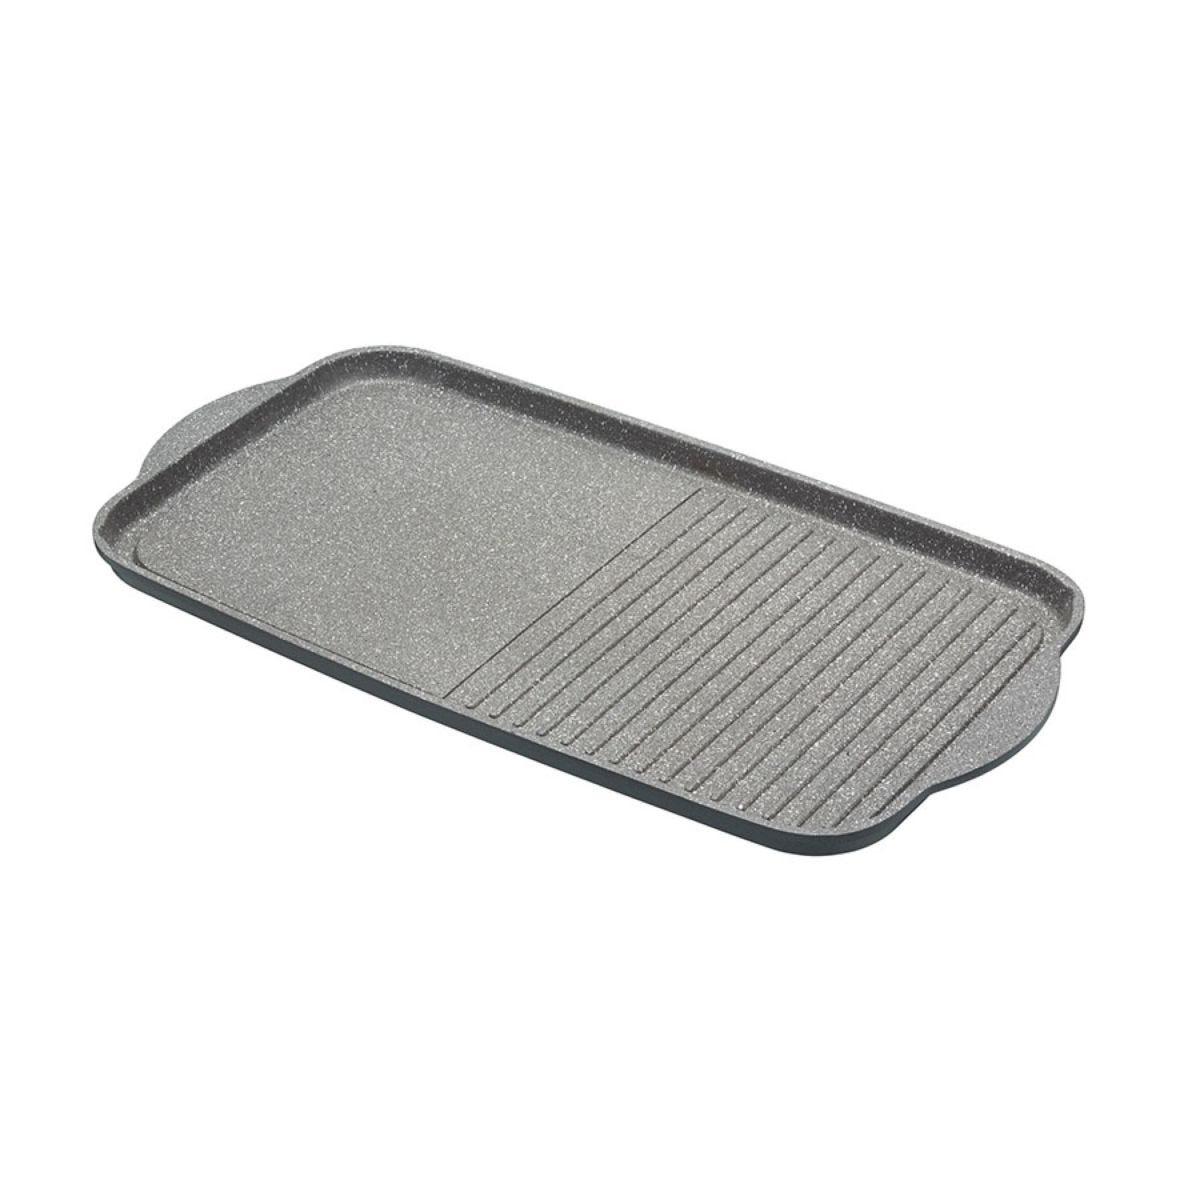 MasterClass 51cm Cast Aluminium Dual Griddle Tray